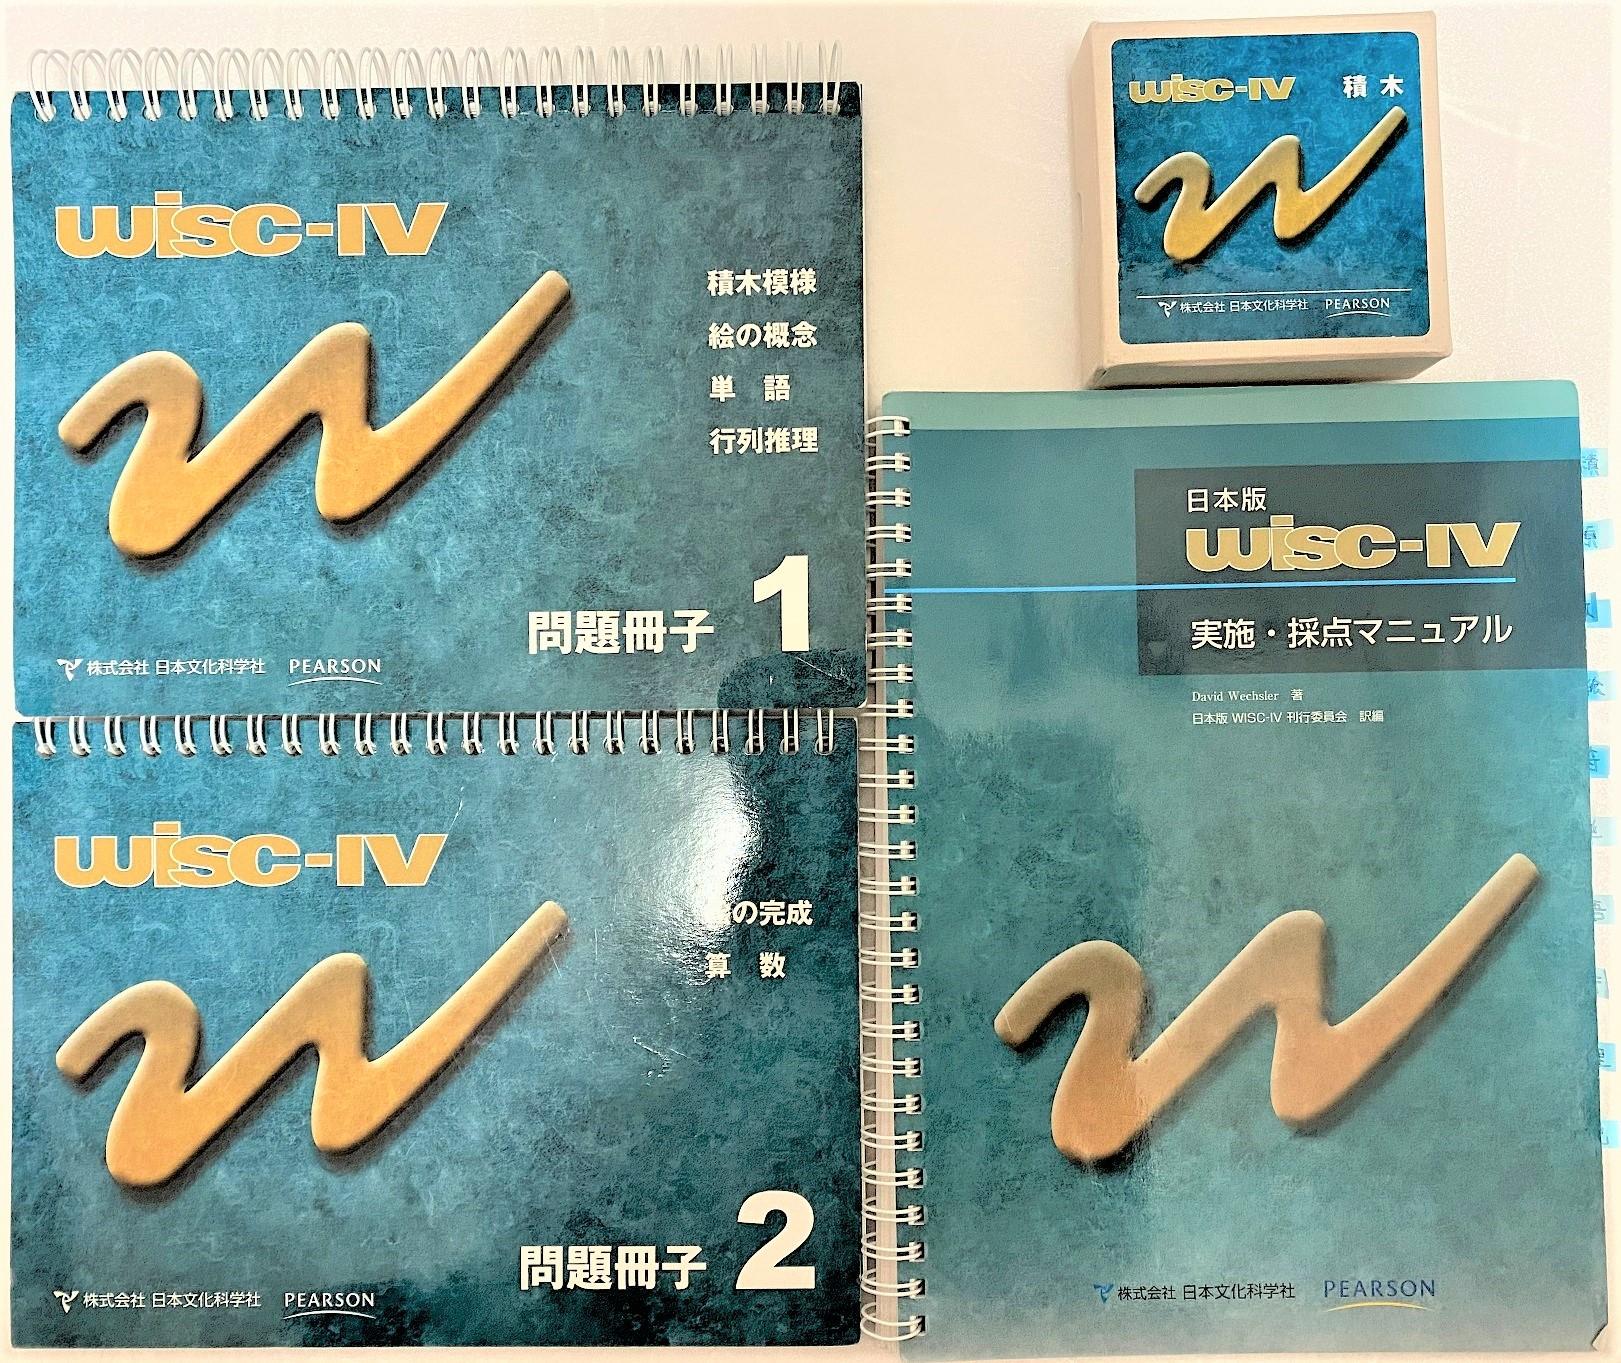 011【WISC-Ⅳ】おススメのWISC4(ウィスク4)検査の受け方とは